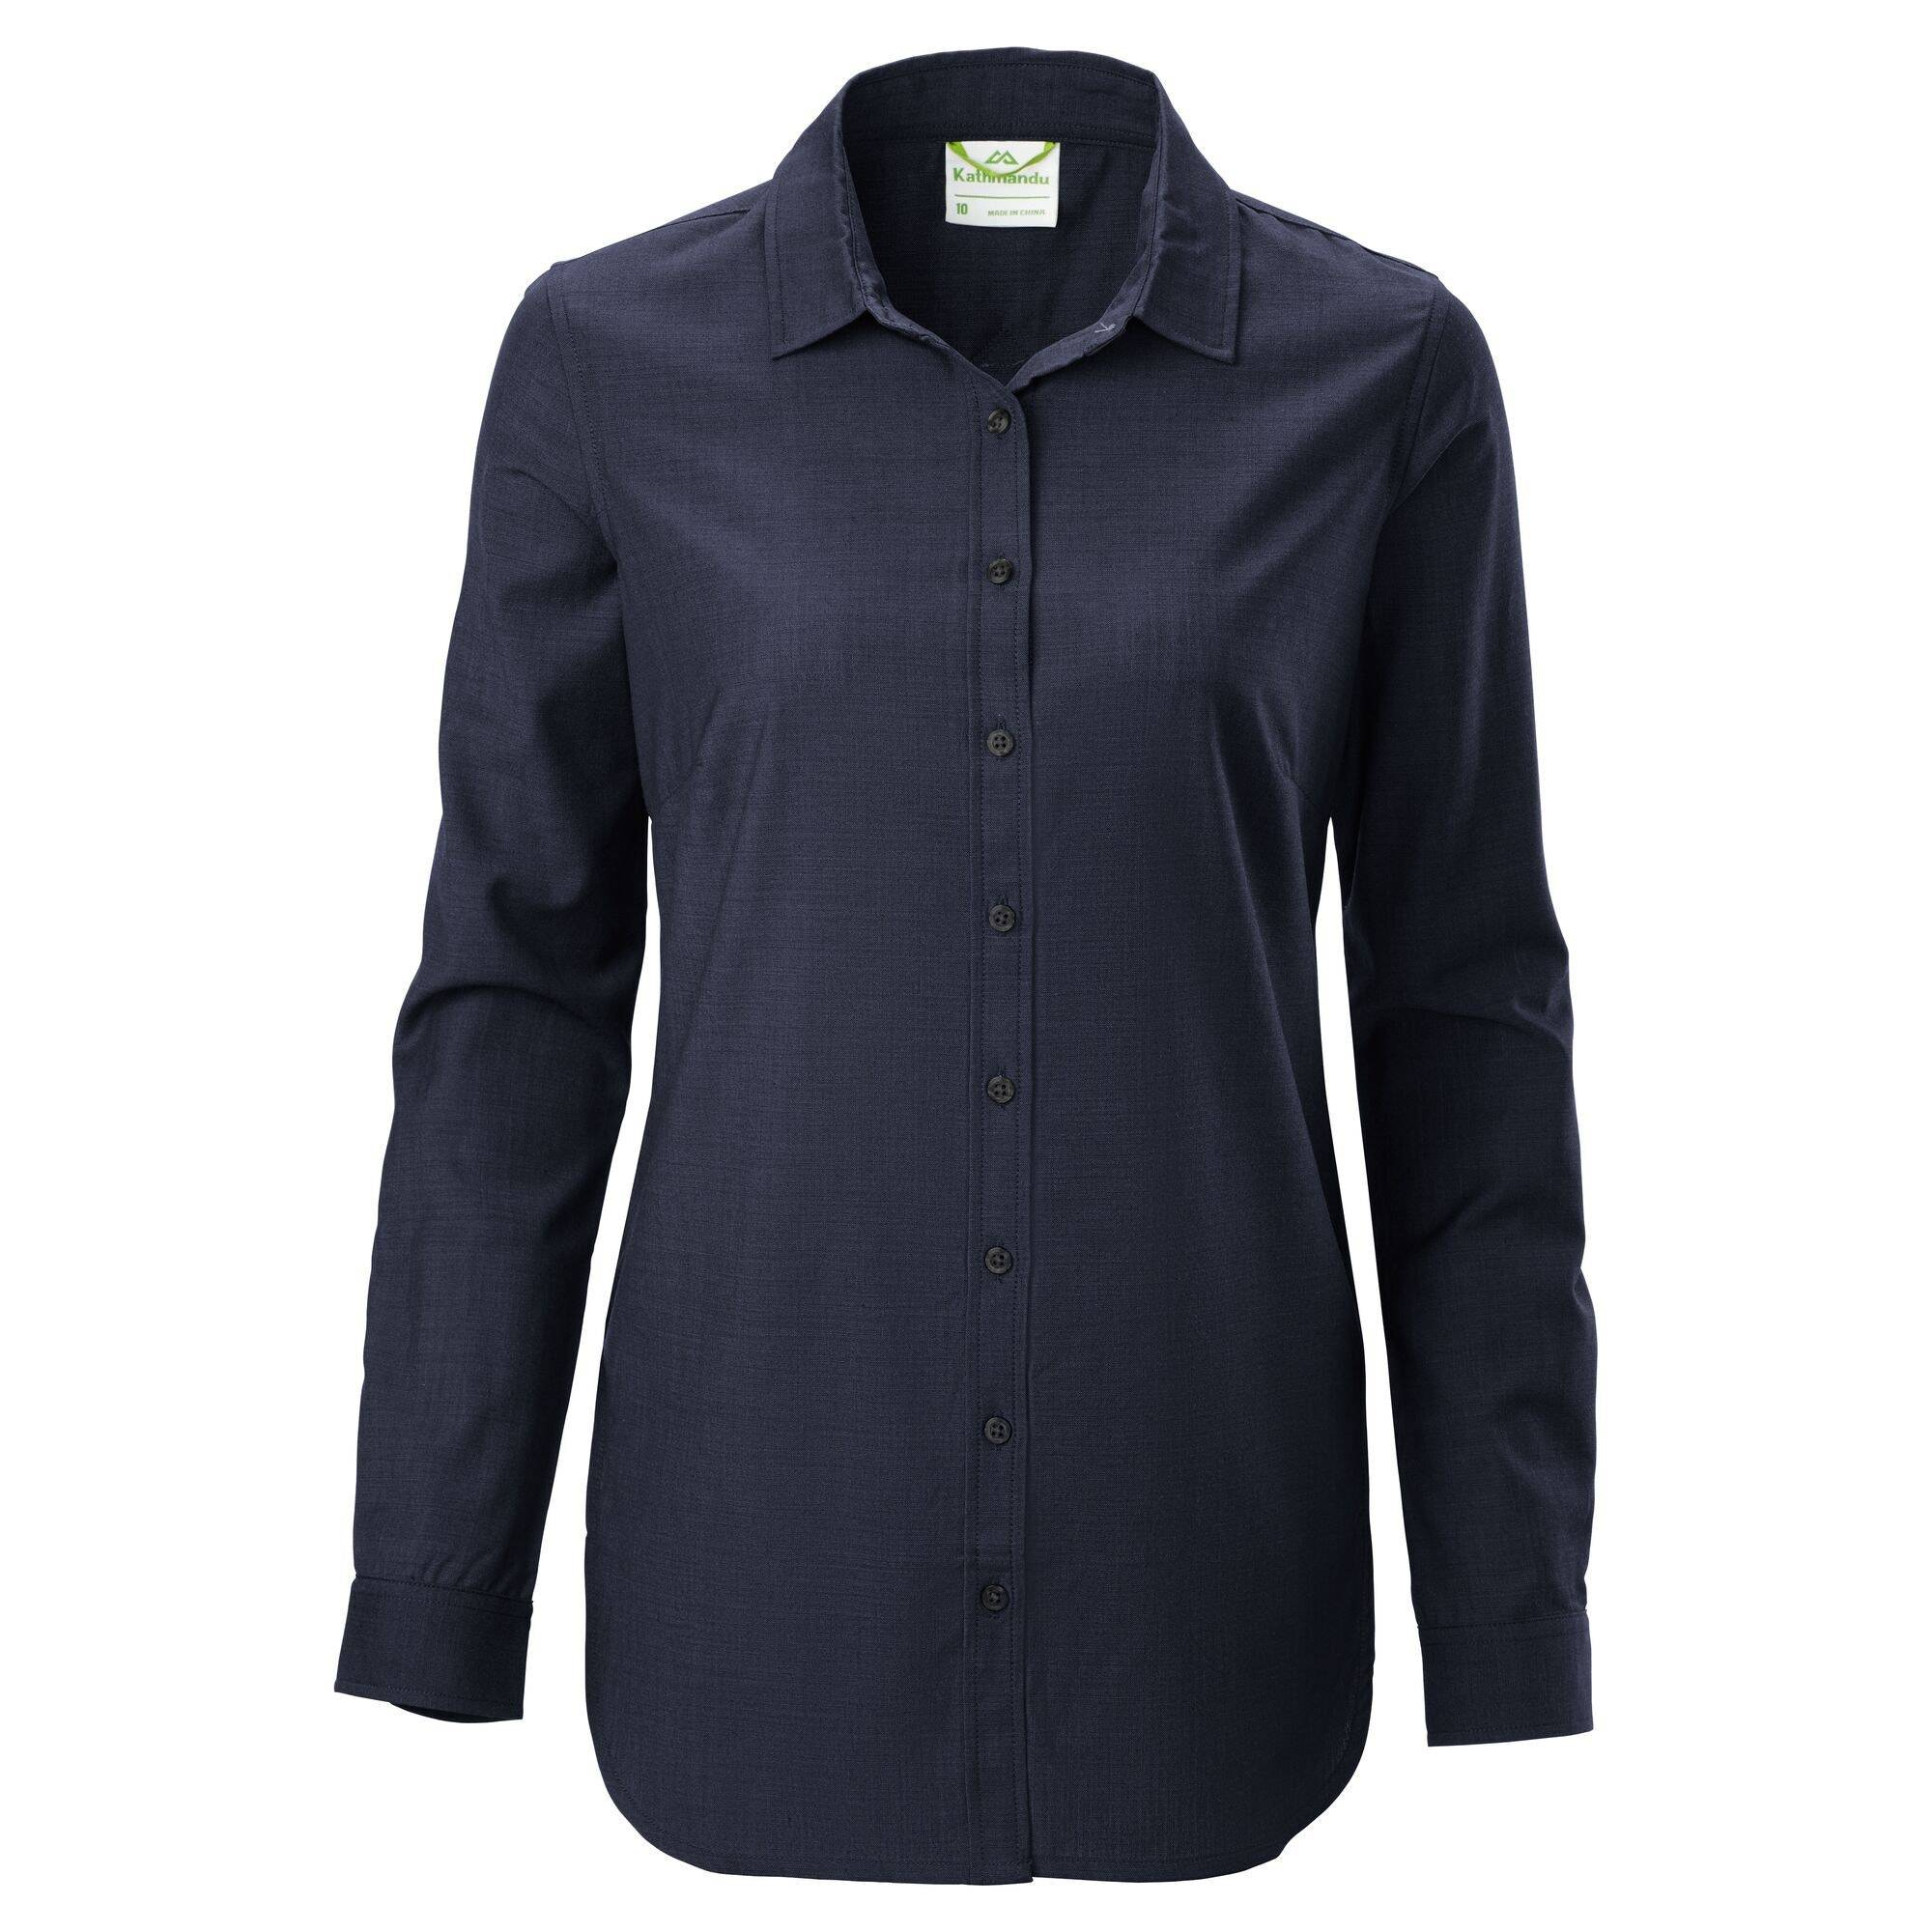 Kathmandu Tomar Women's Merino Long Sleeve Shirt  - Darkest Navy - Size: US 6